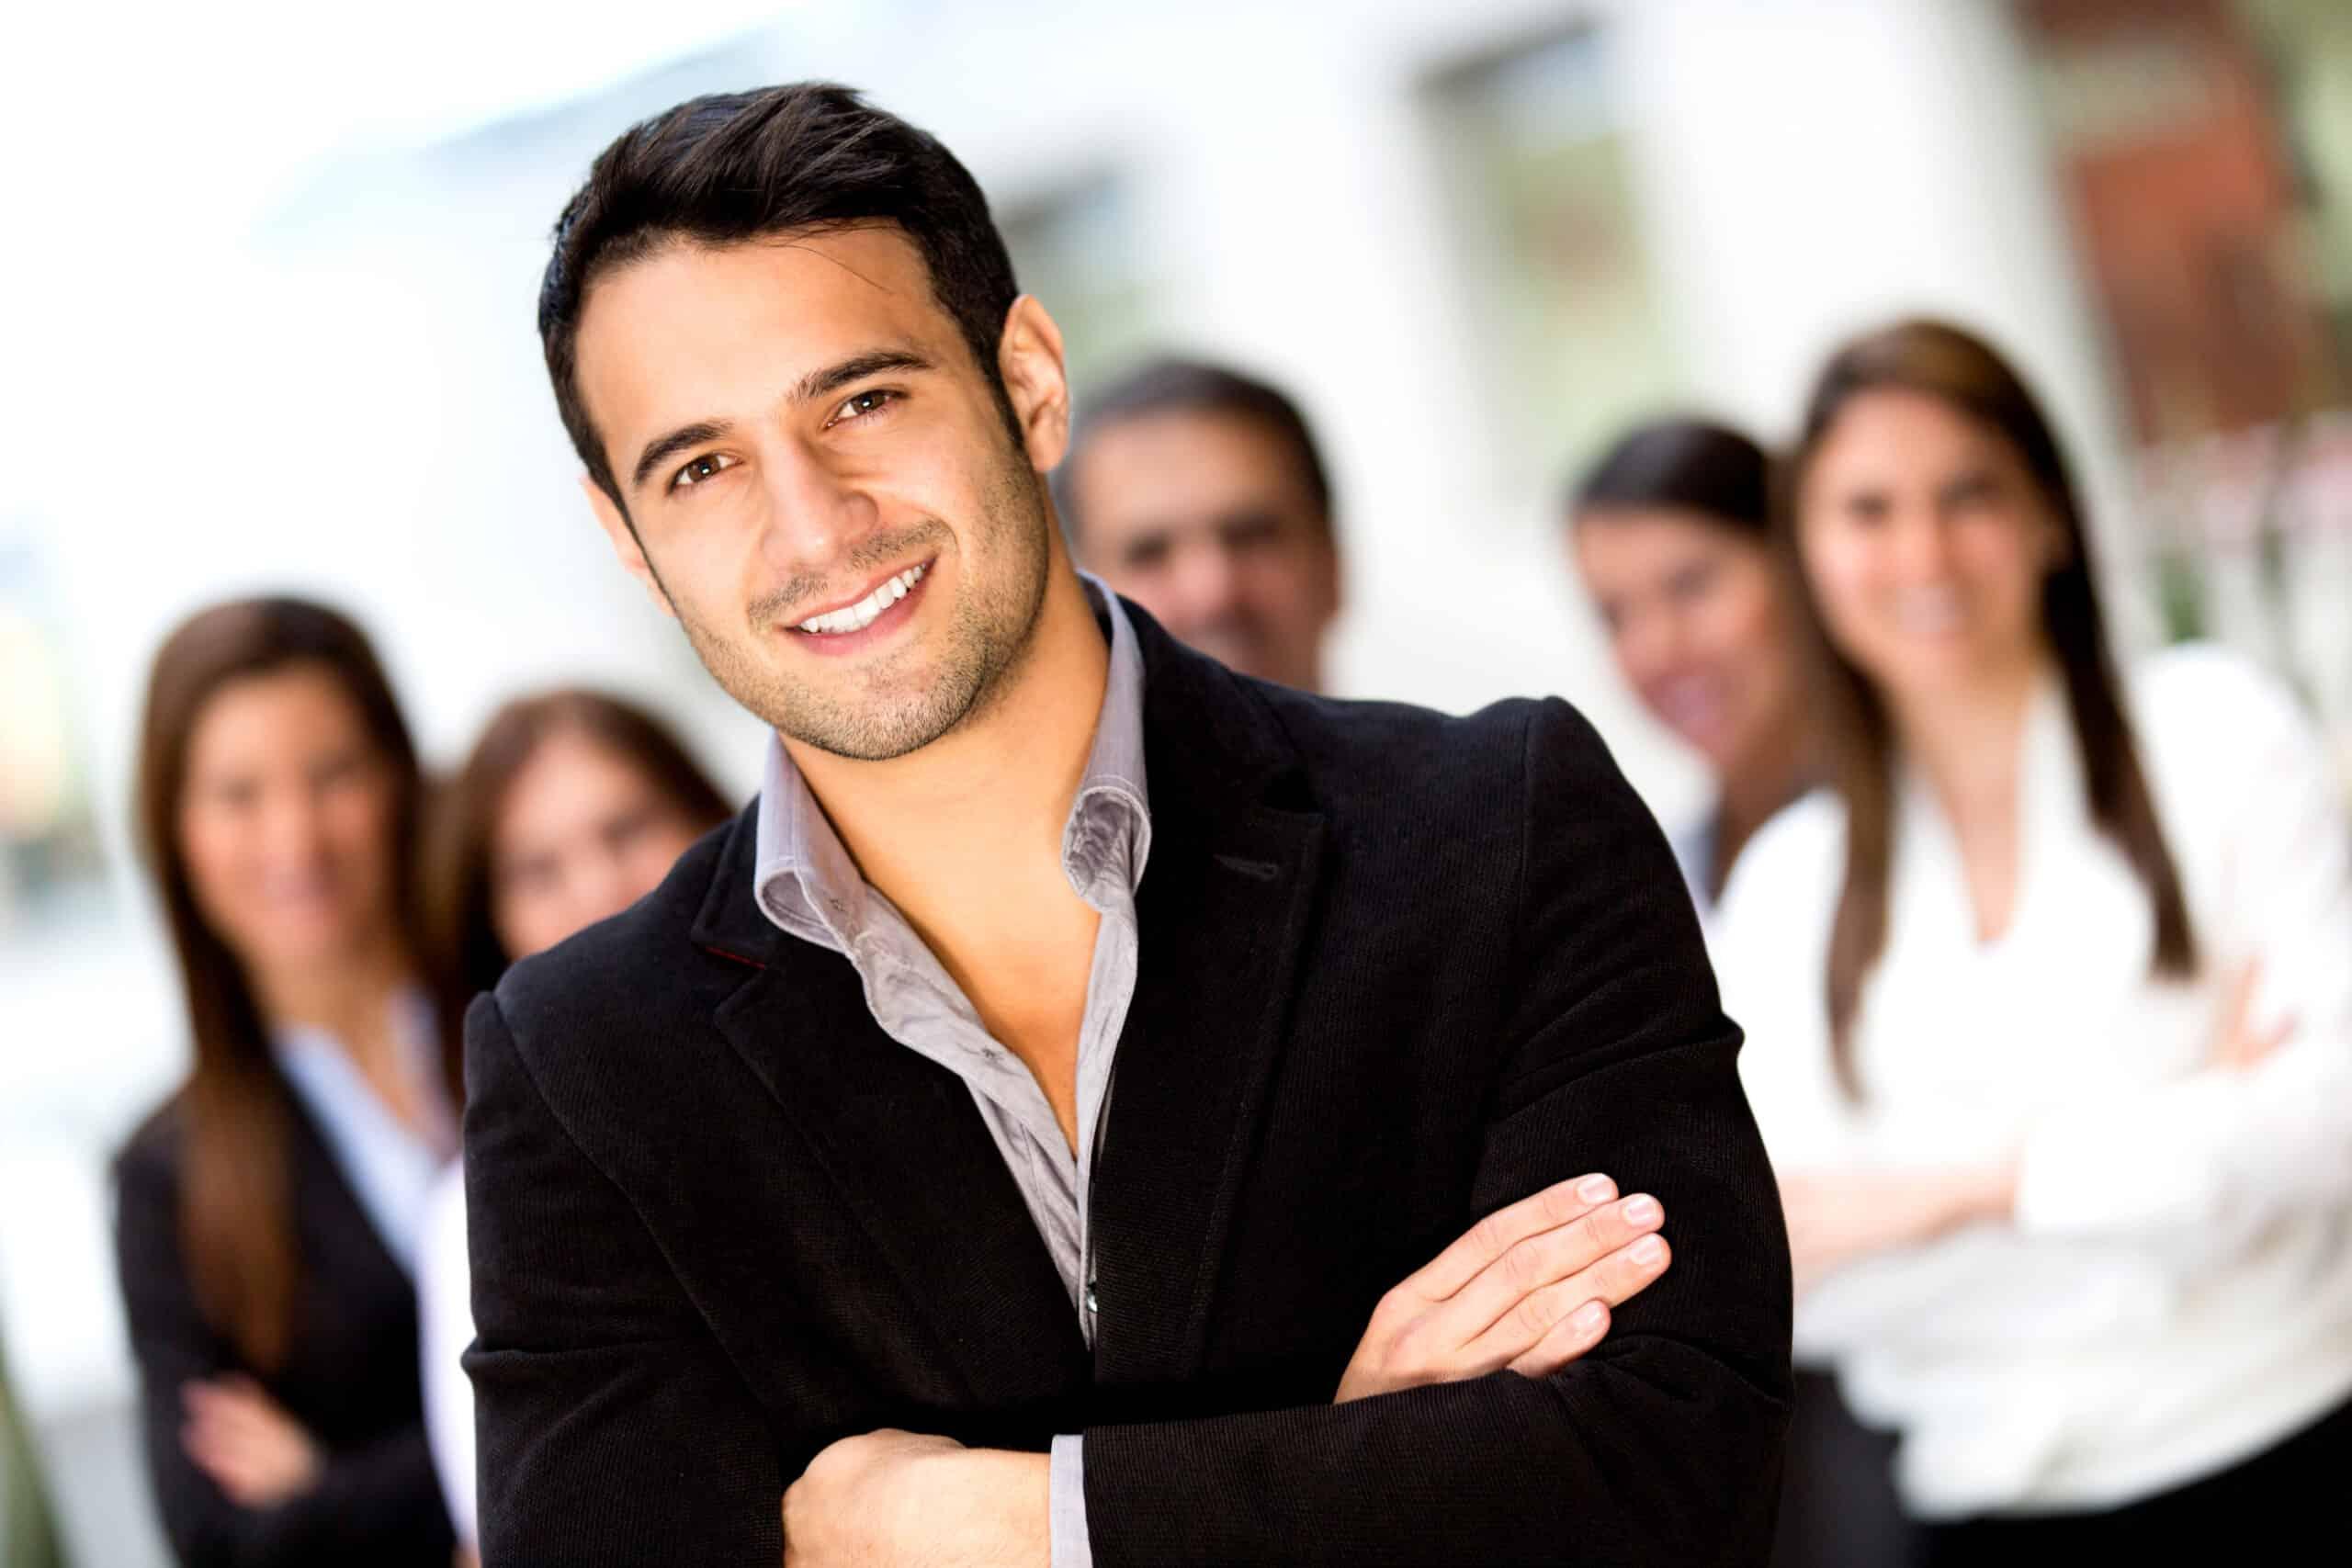 McAfee-Institute كيفية تحسين أداء الموظفين و بناء شركة مستقرة داخليا